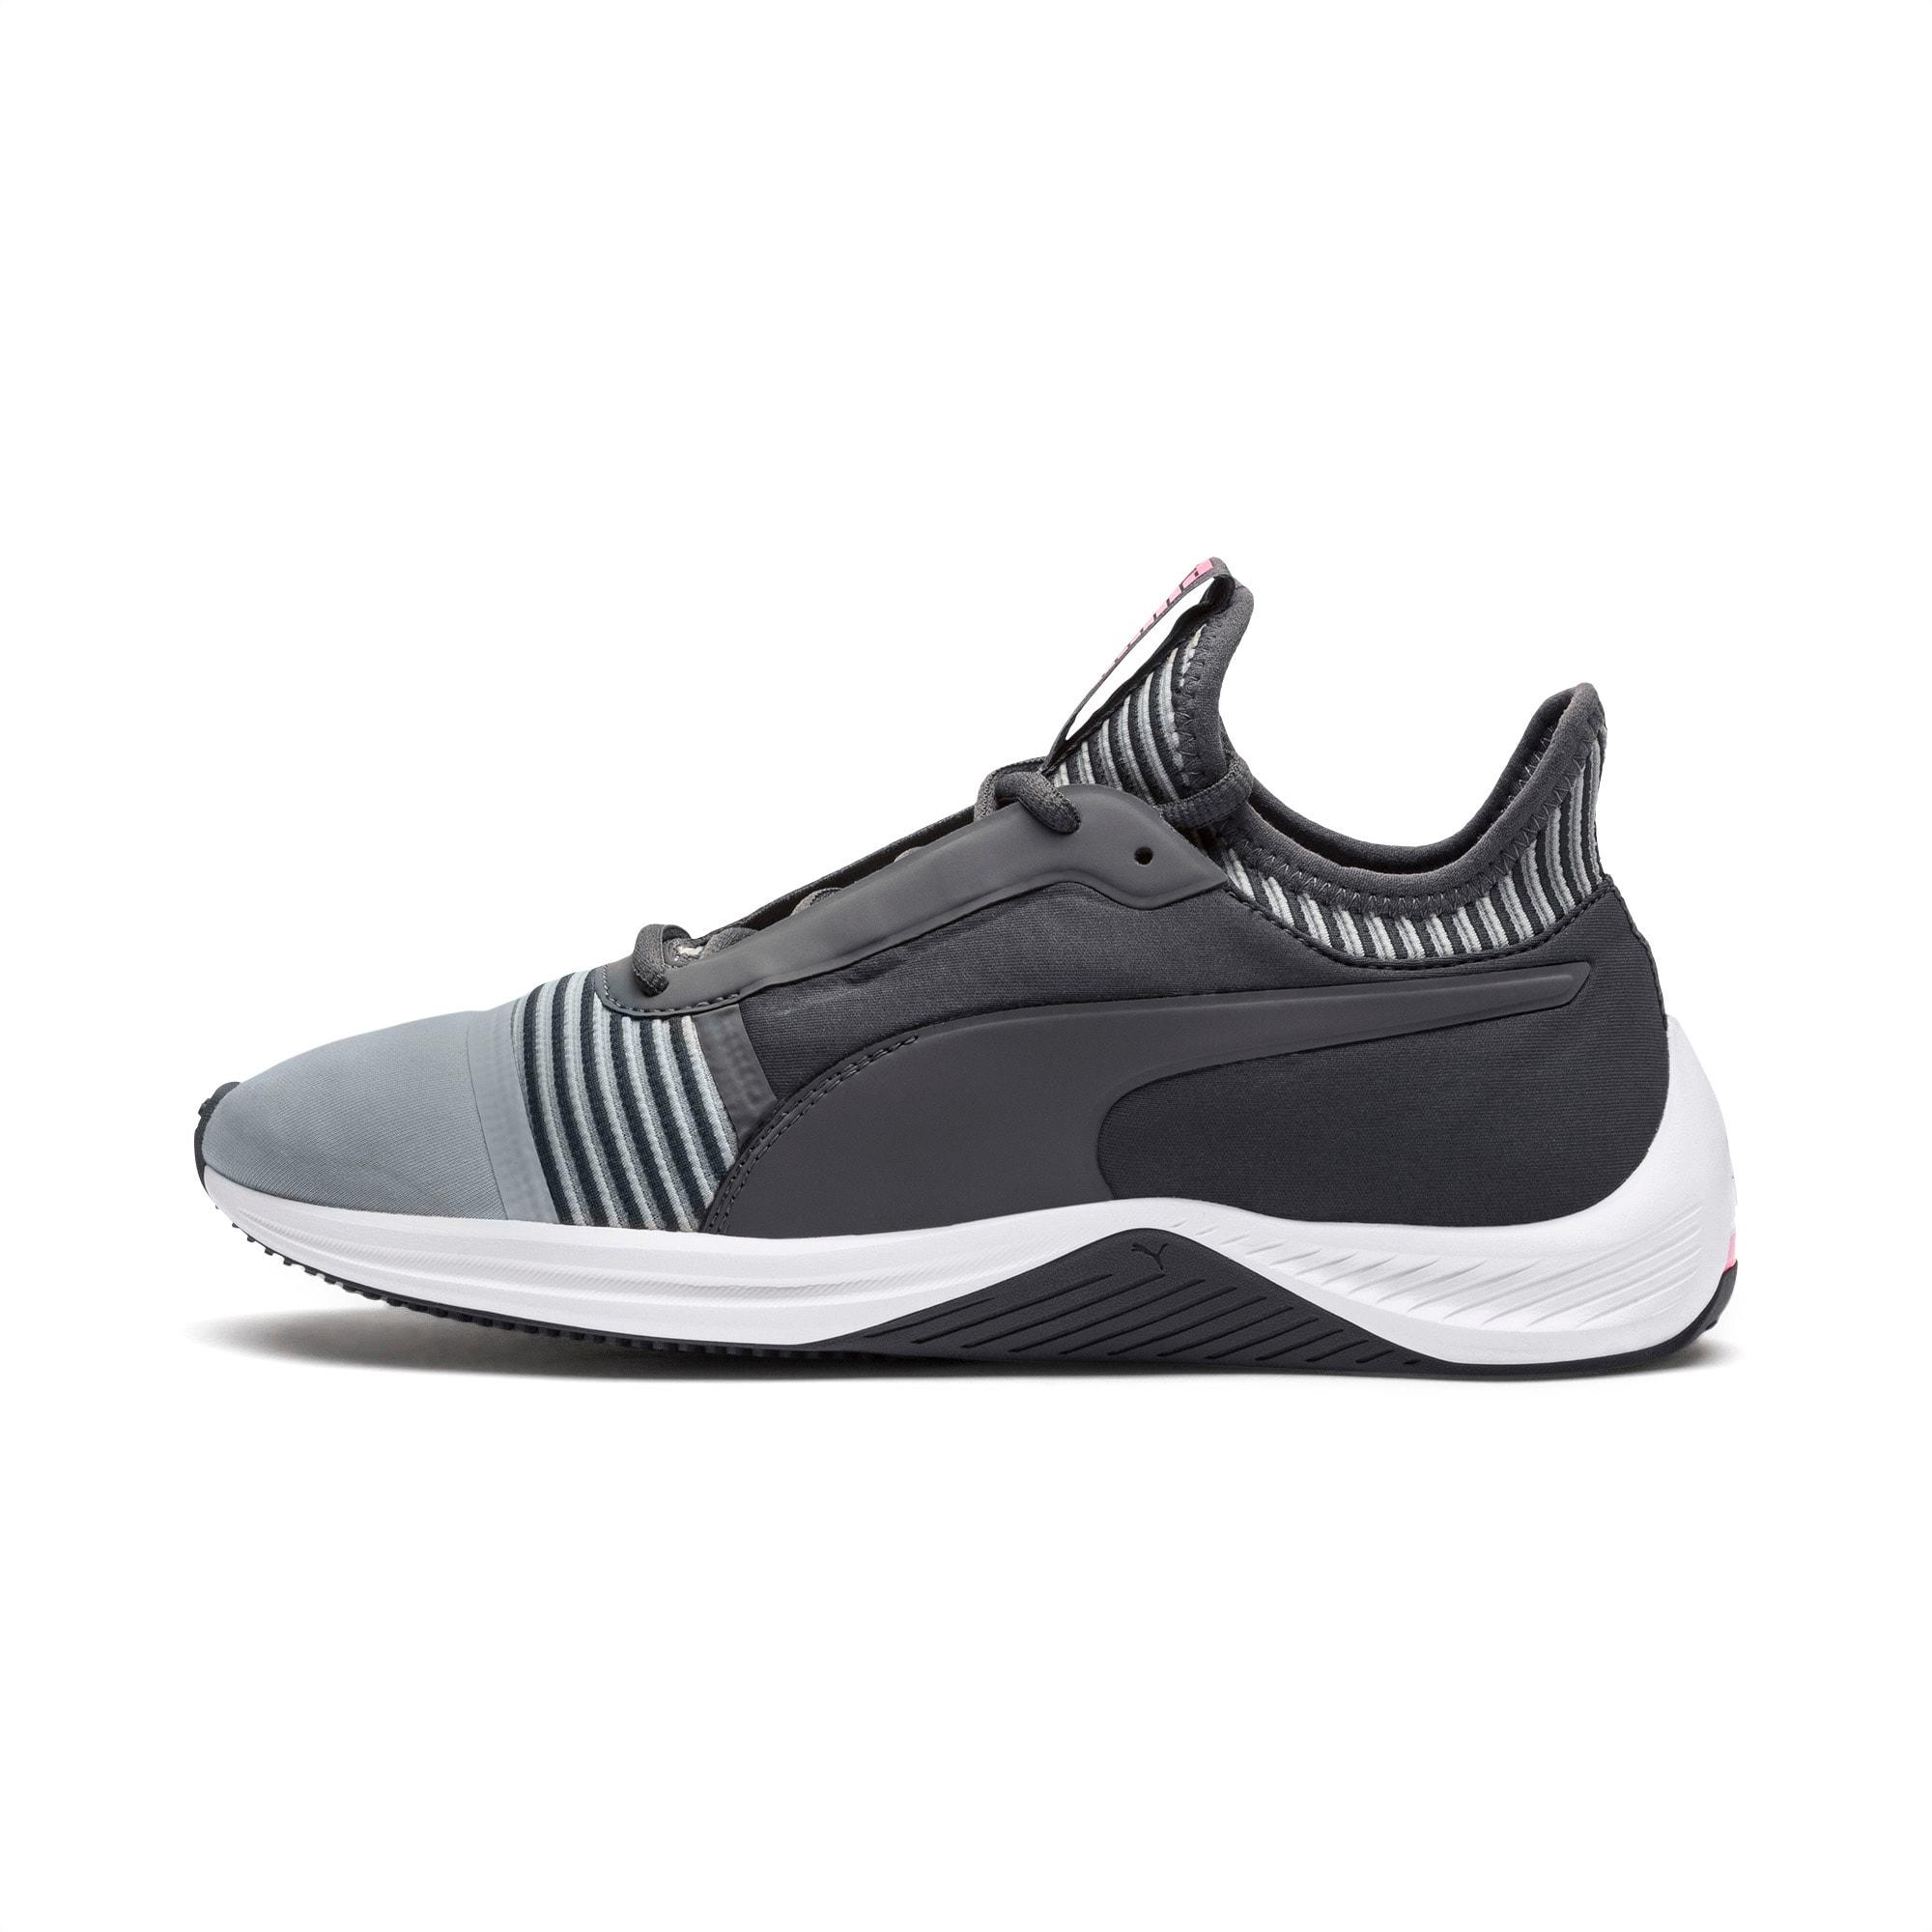 Amp XT Women's Training Shoes